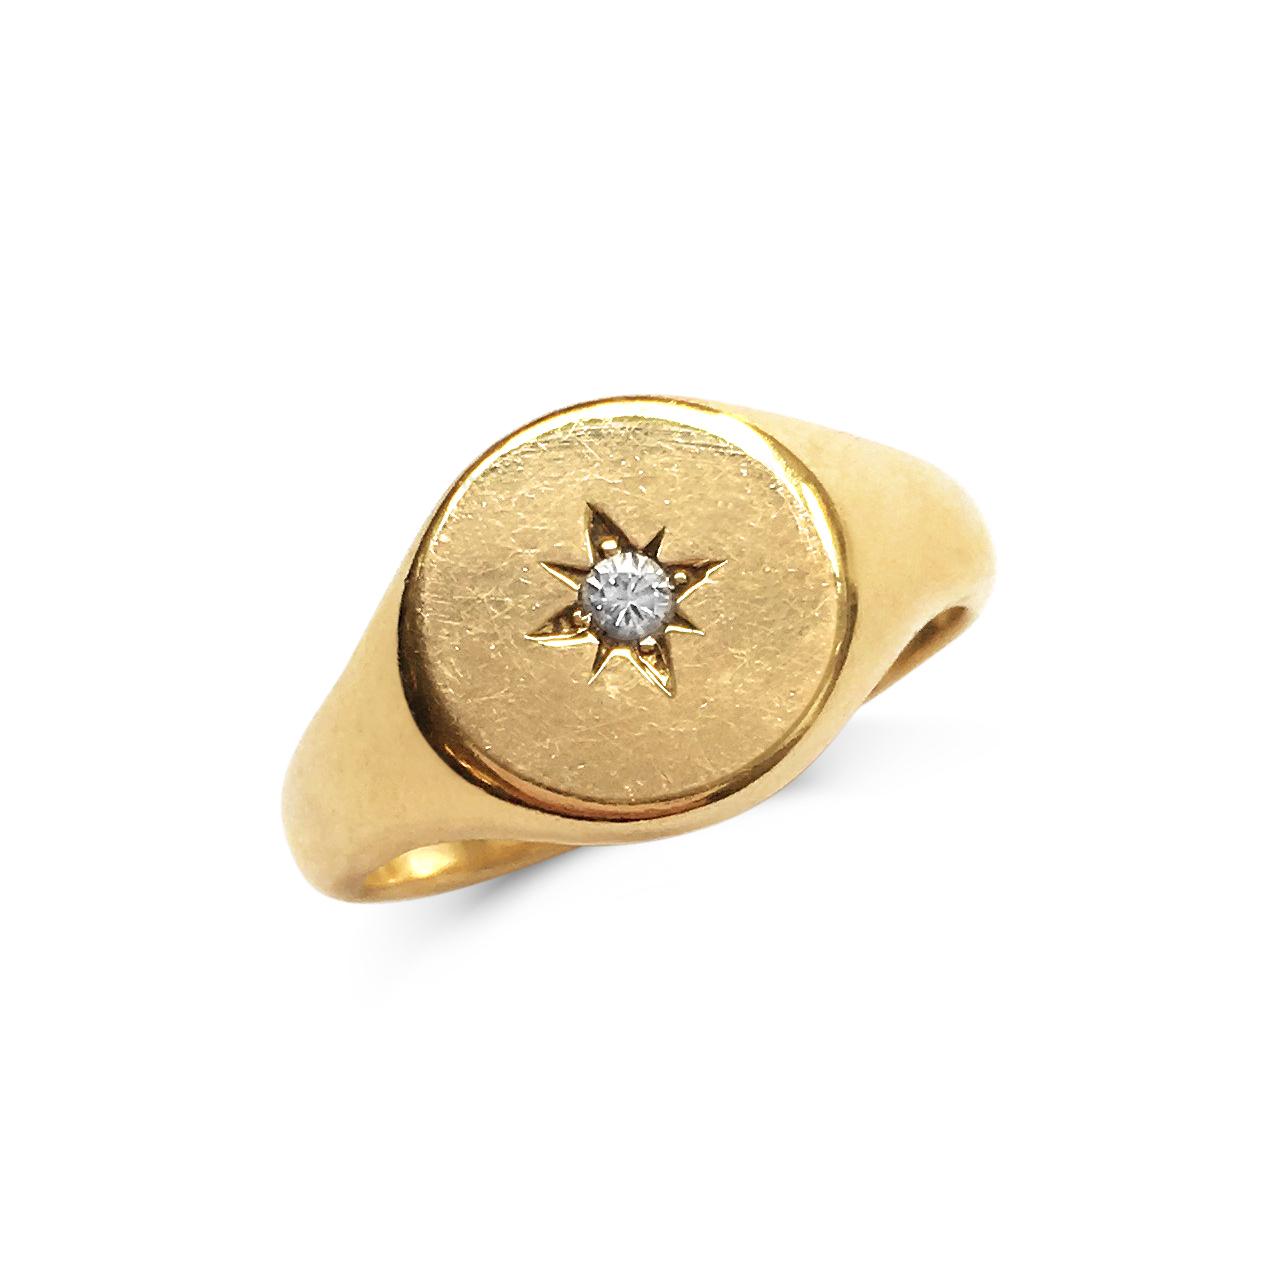 Vintage 9CT Yellow Gold Diamond-Set Star Signet Ring Top